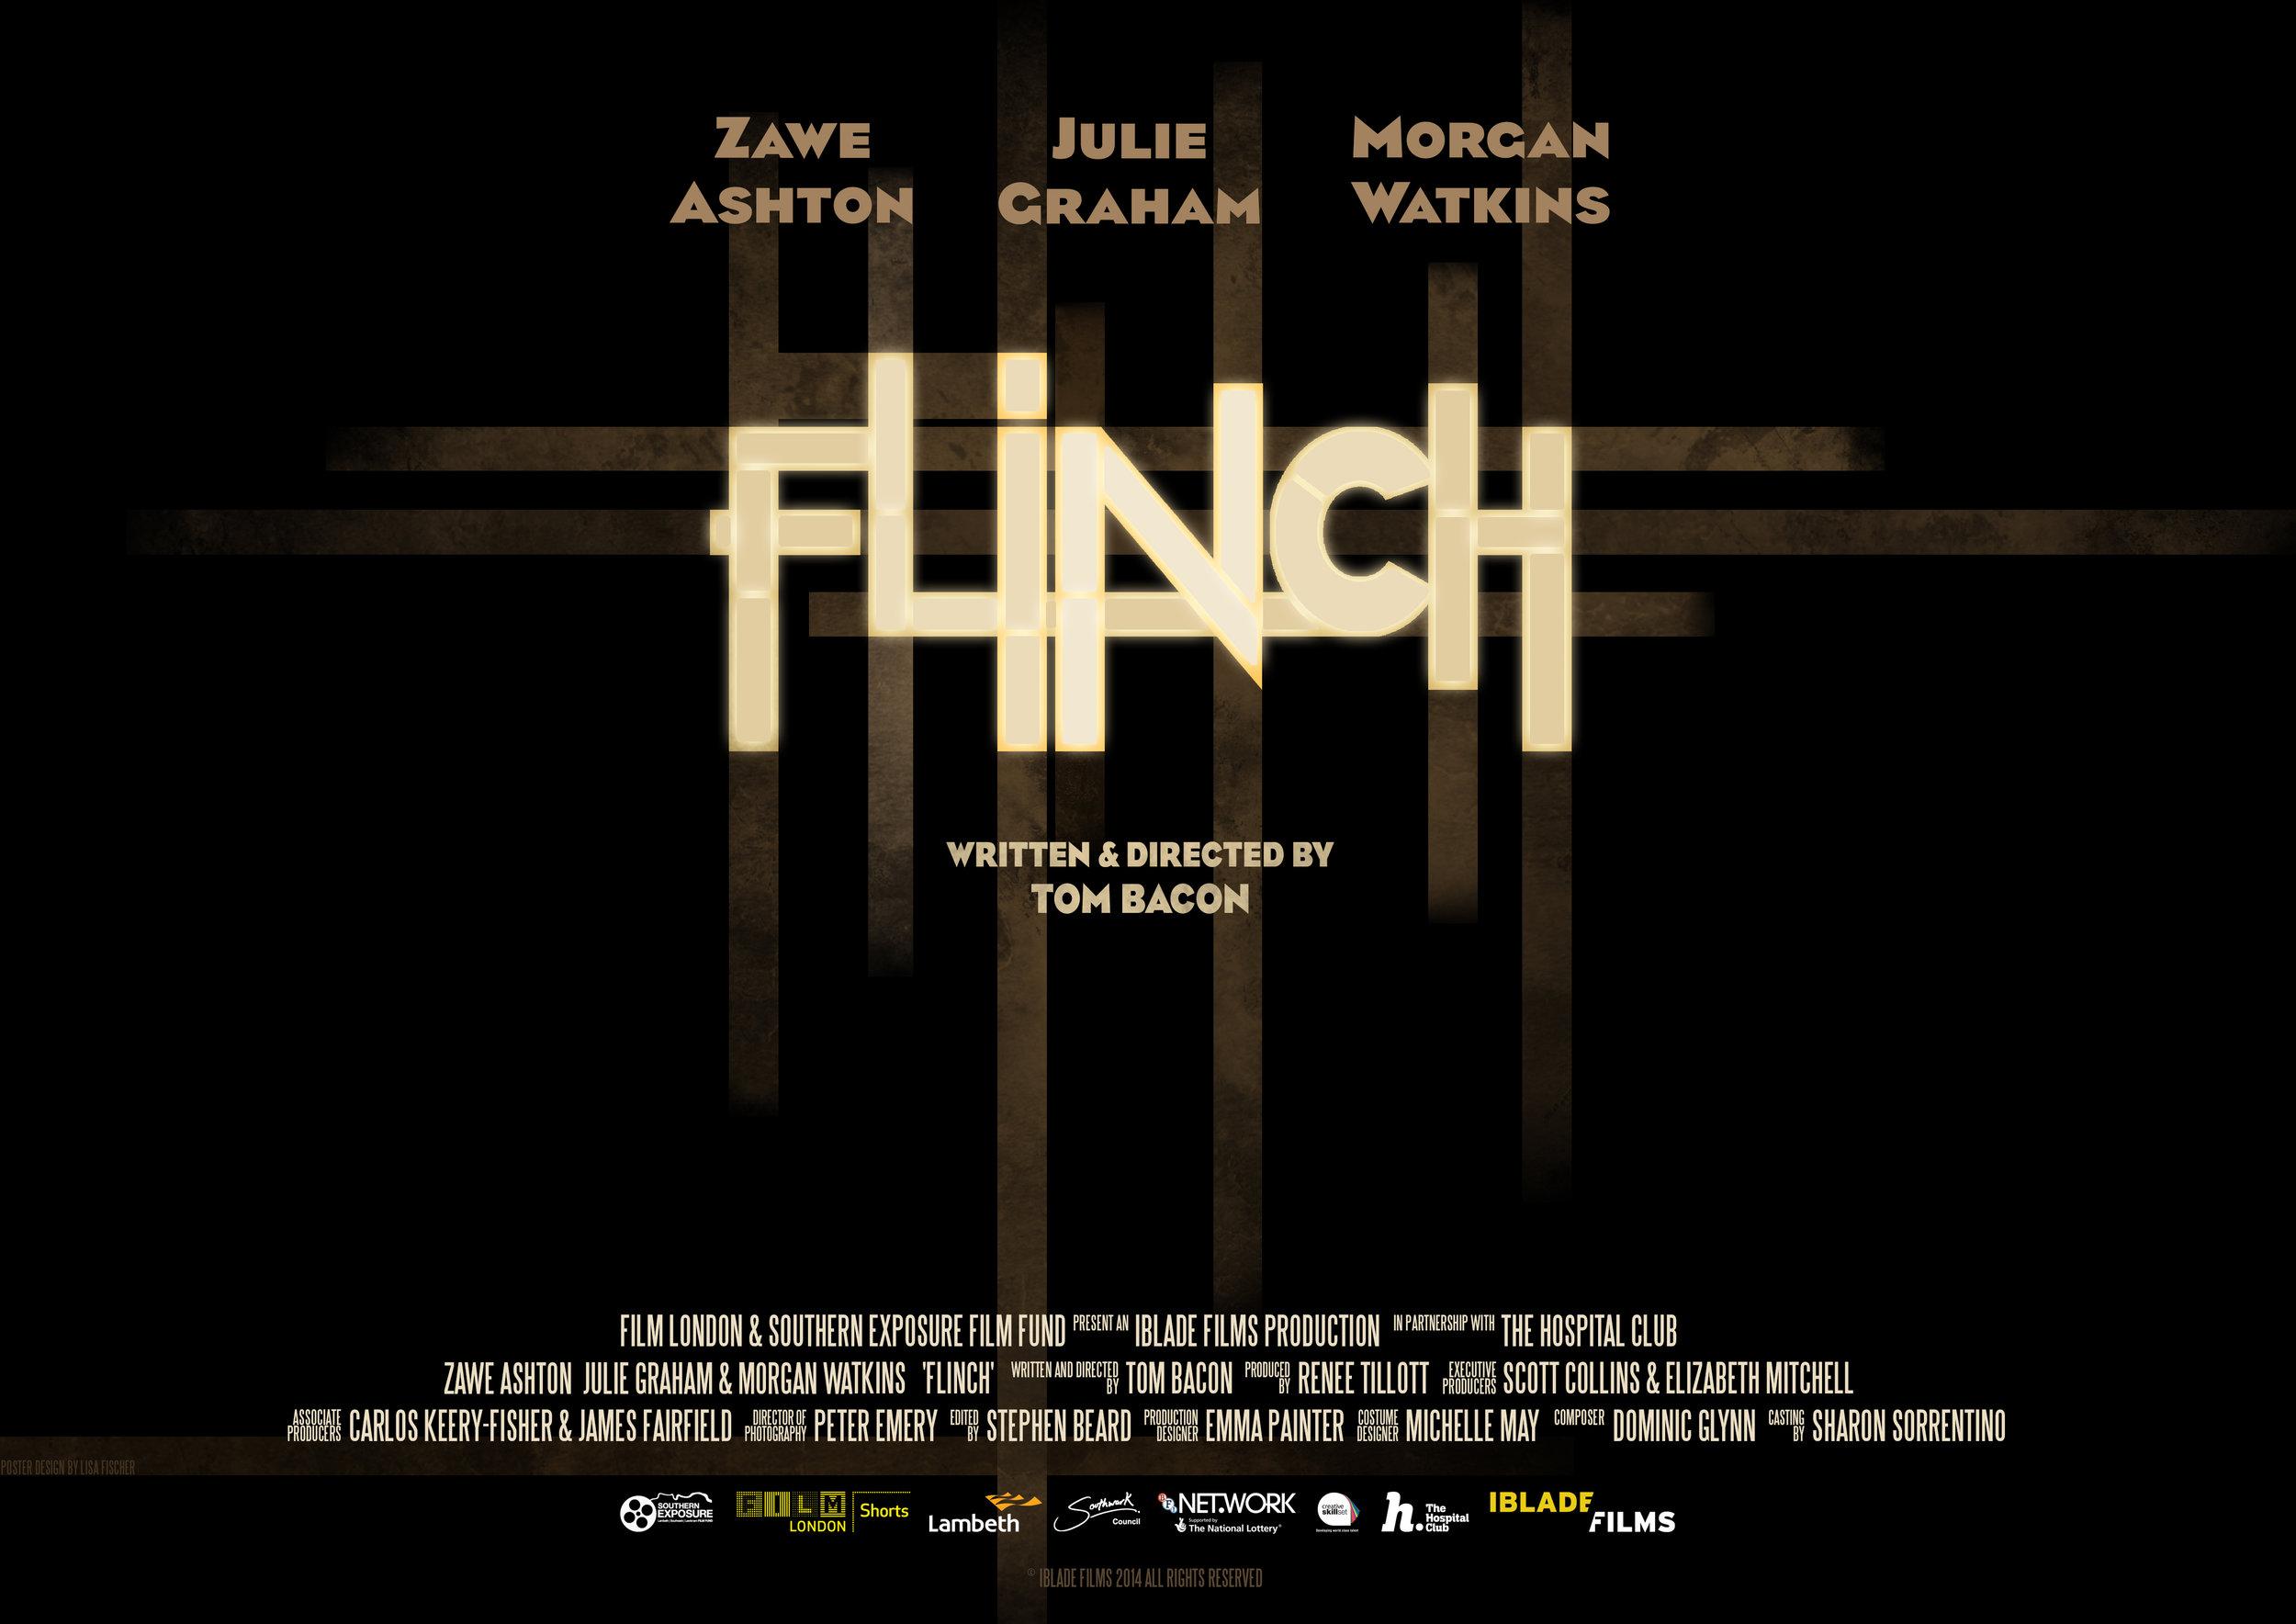 FLINCH_Poster_RGB_Large copy.jpg